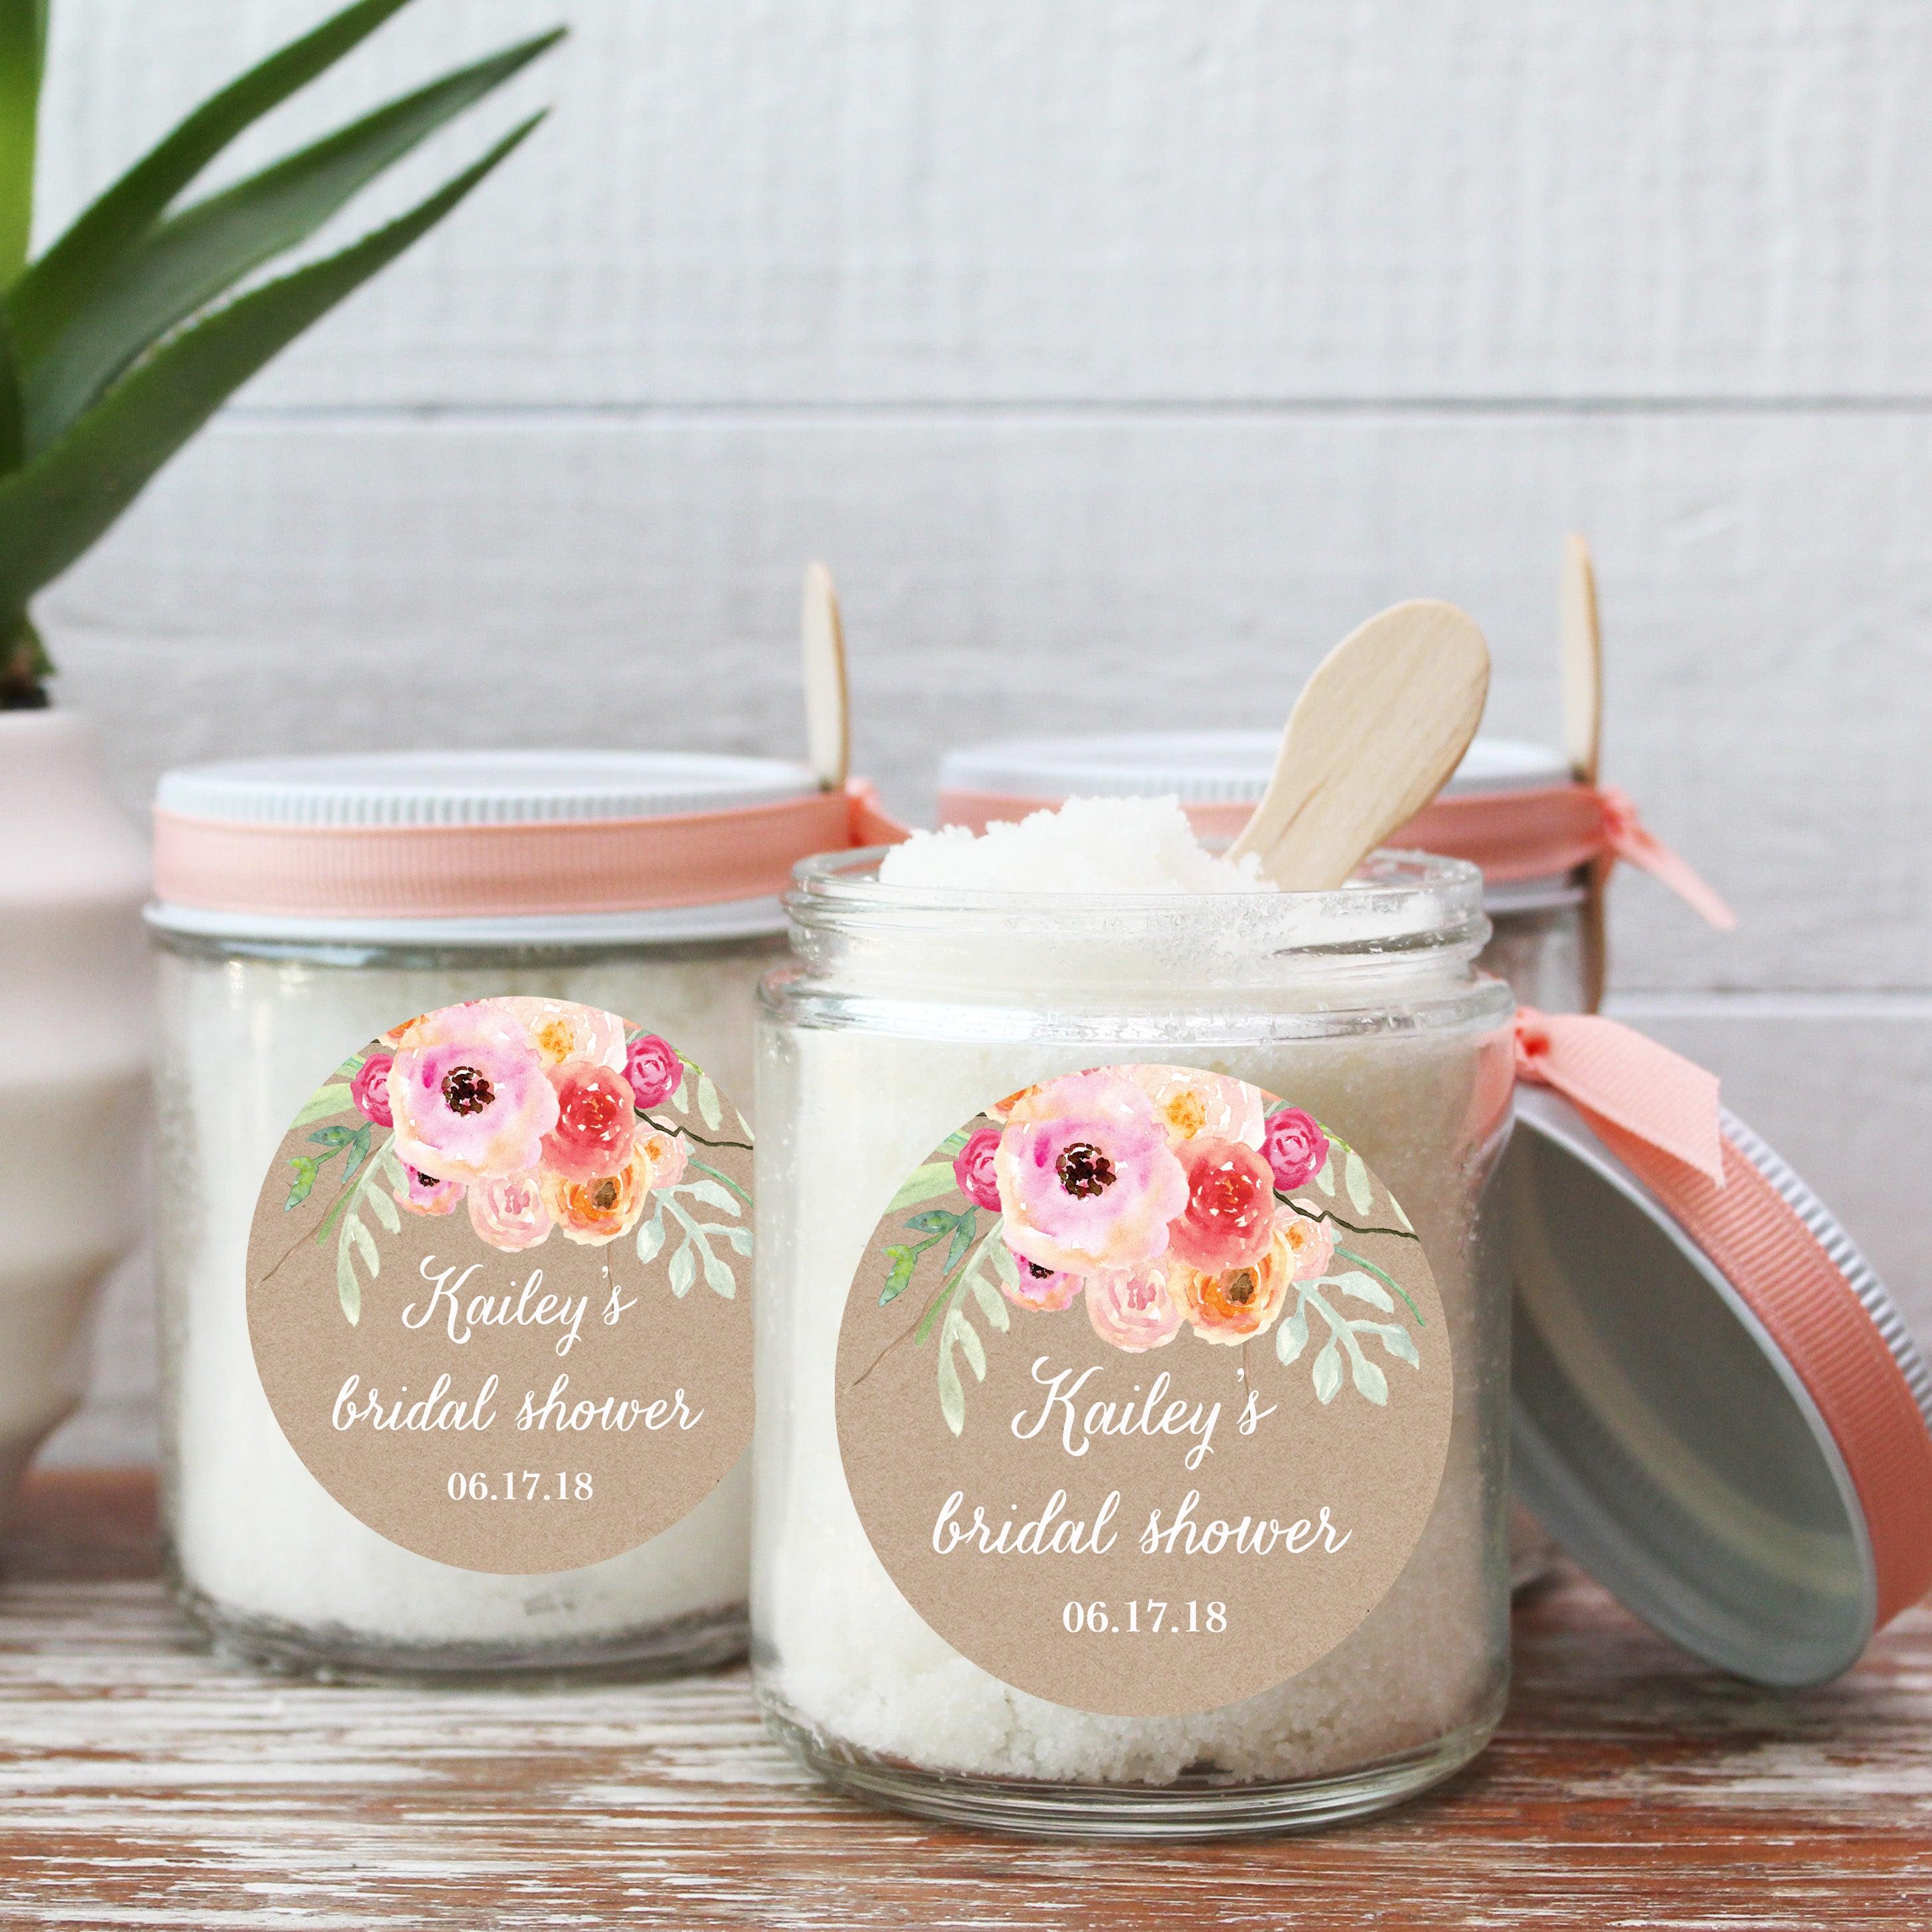 8 oz Sugar Scrub Favors All Natural Floral Bouquet Label